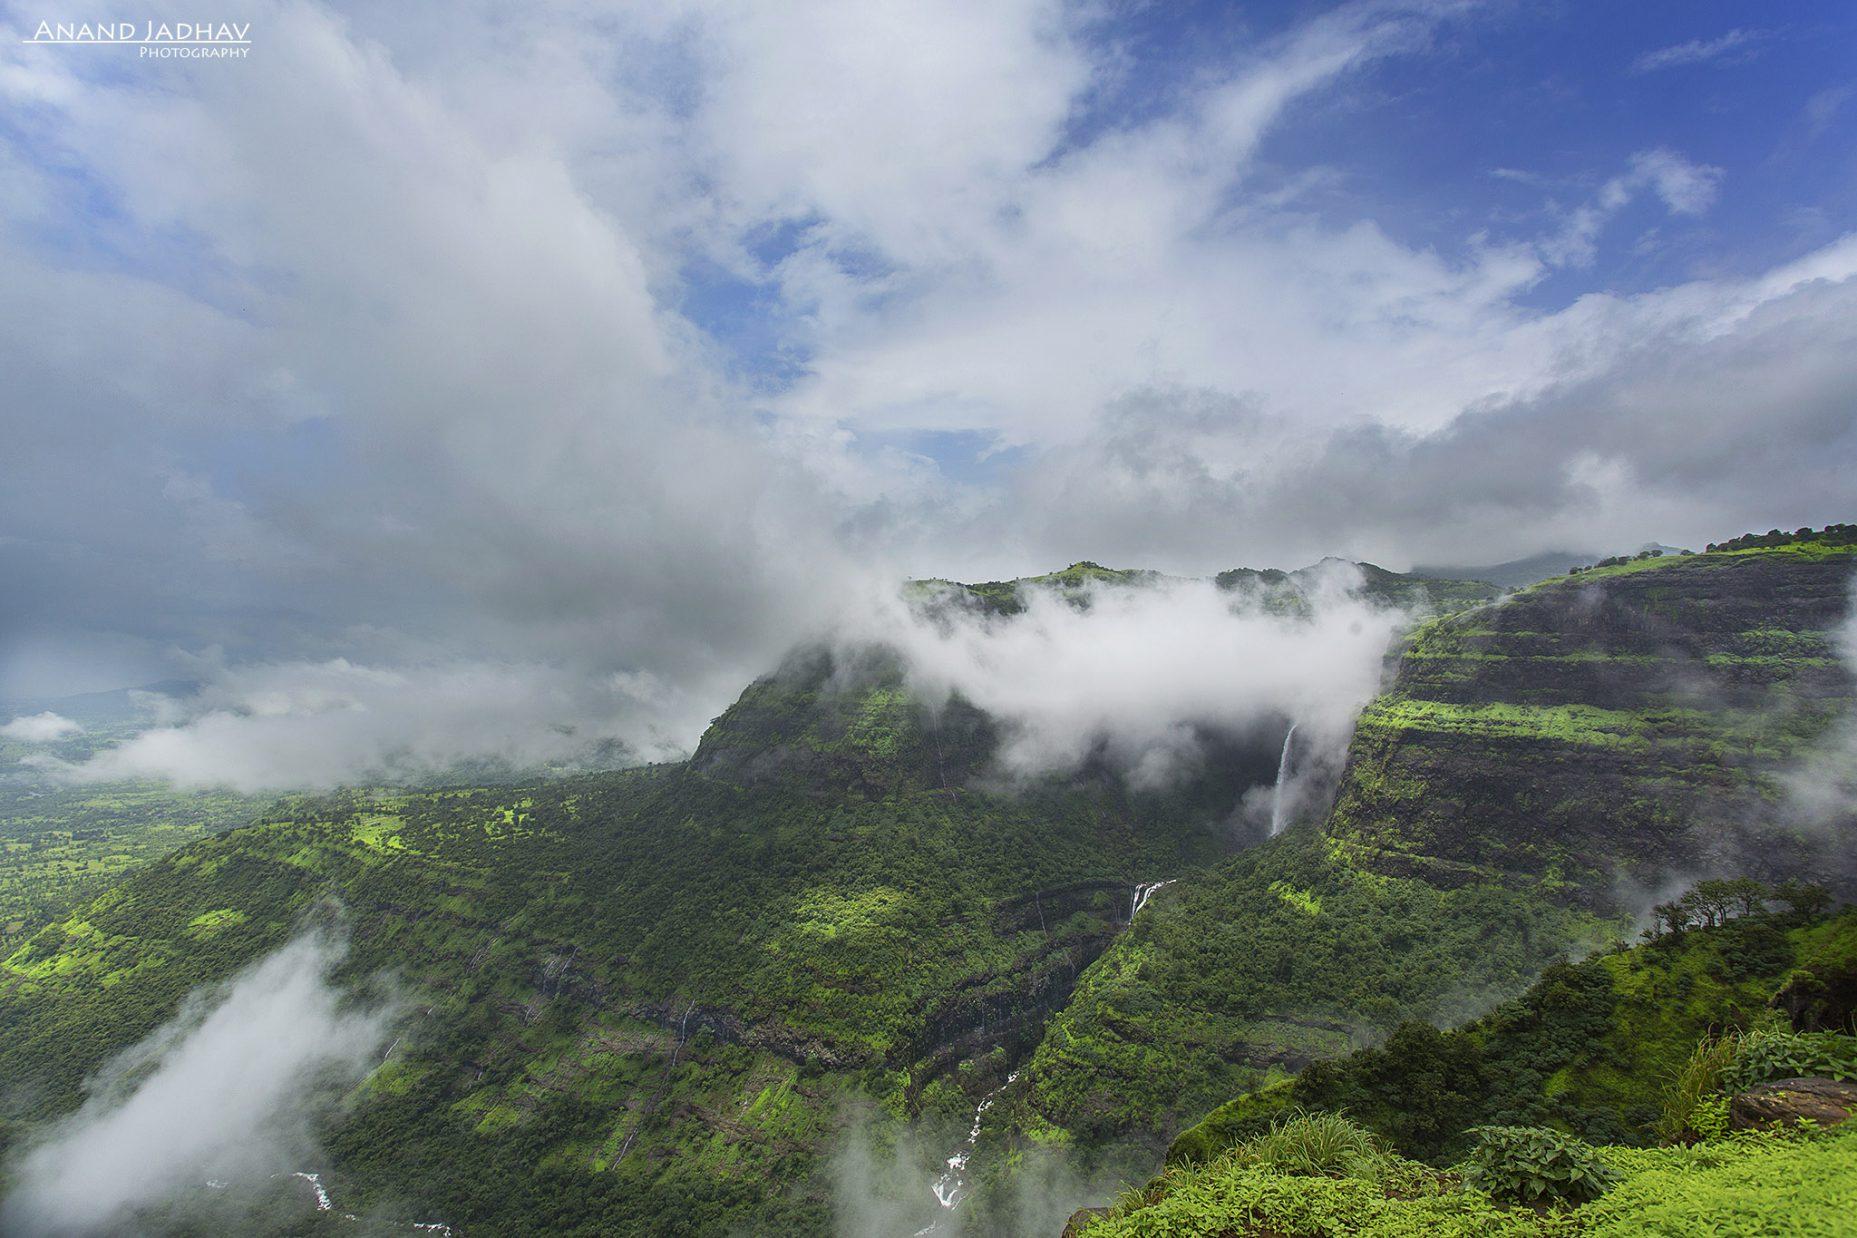 Landscape – Monsoon